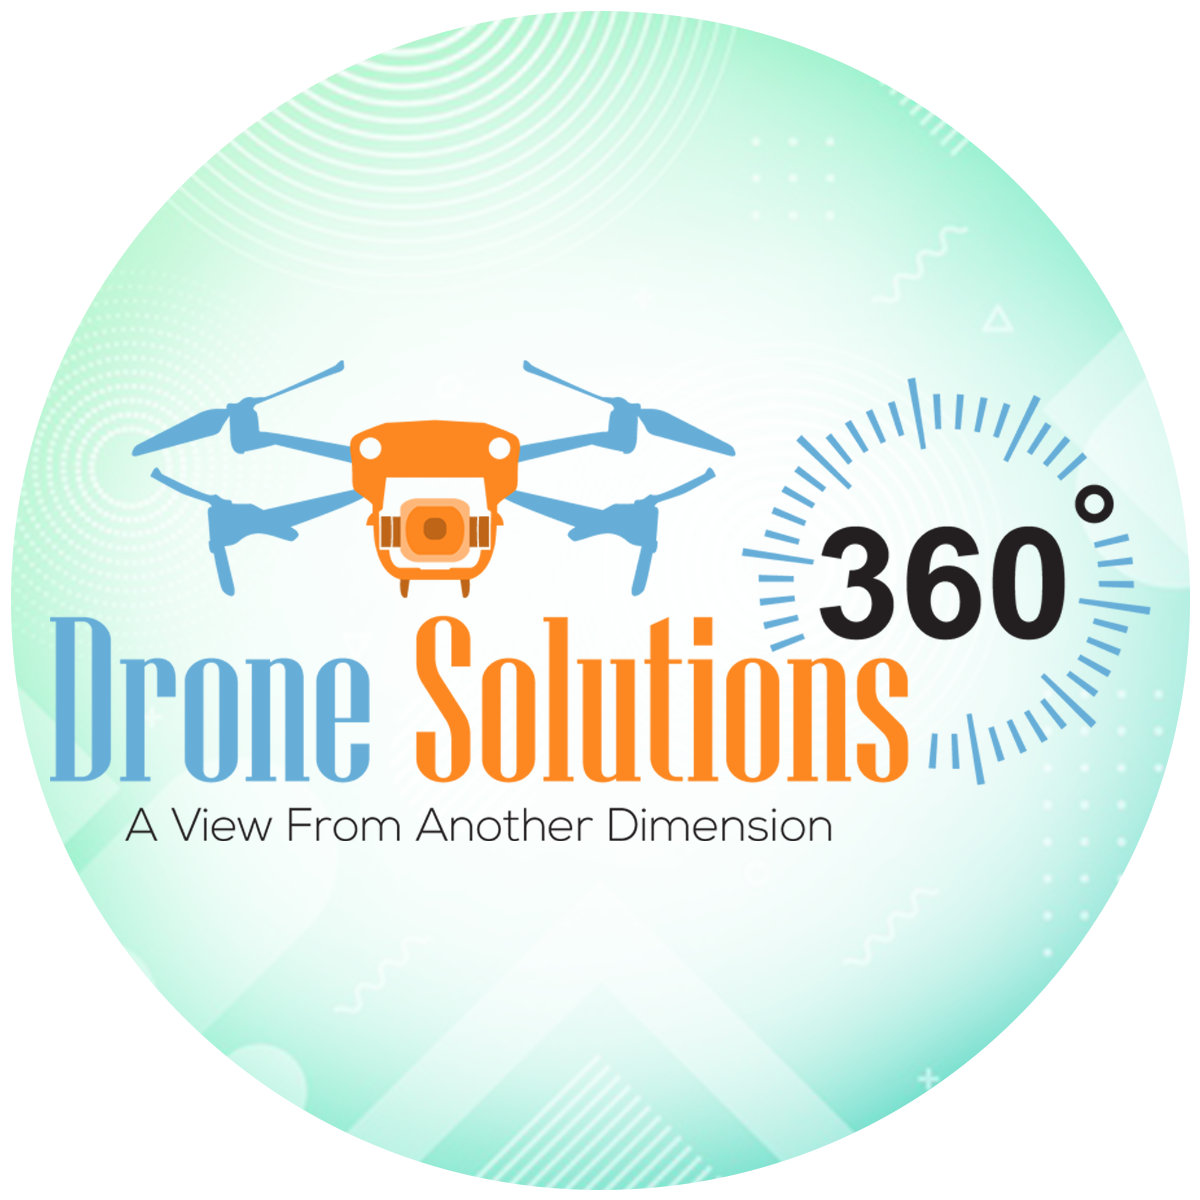 dronesolutions360